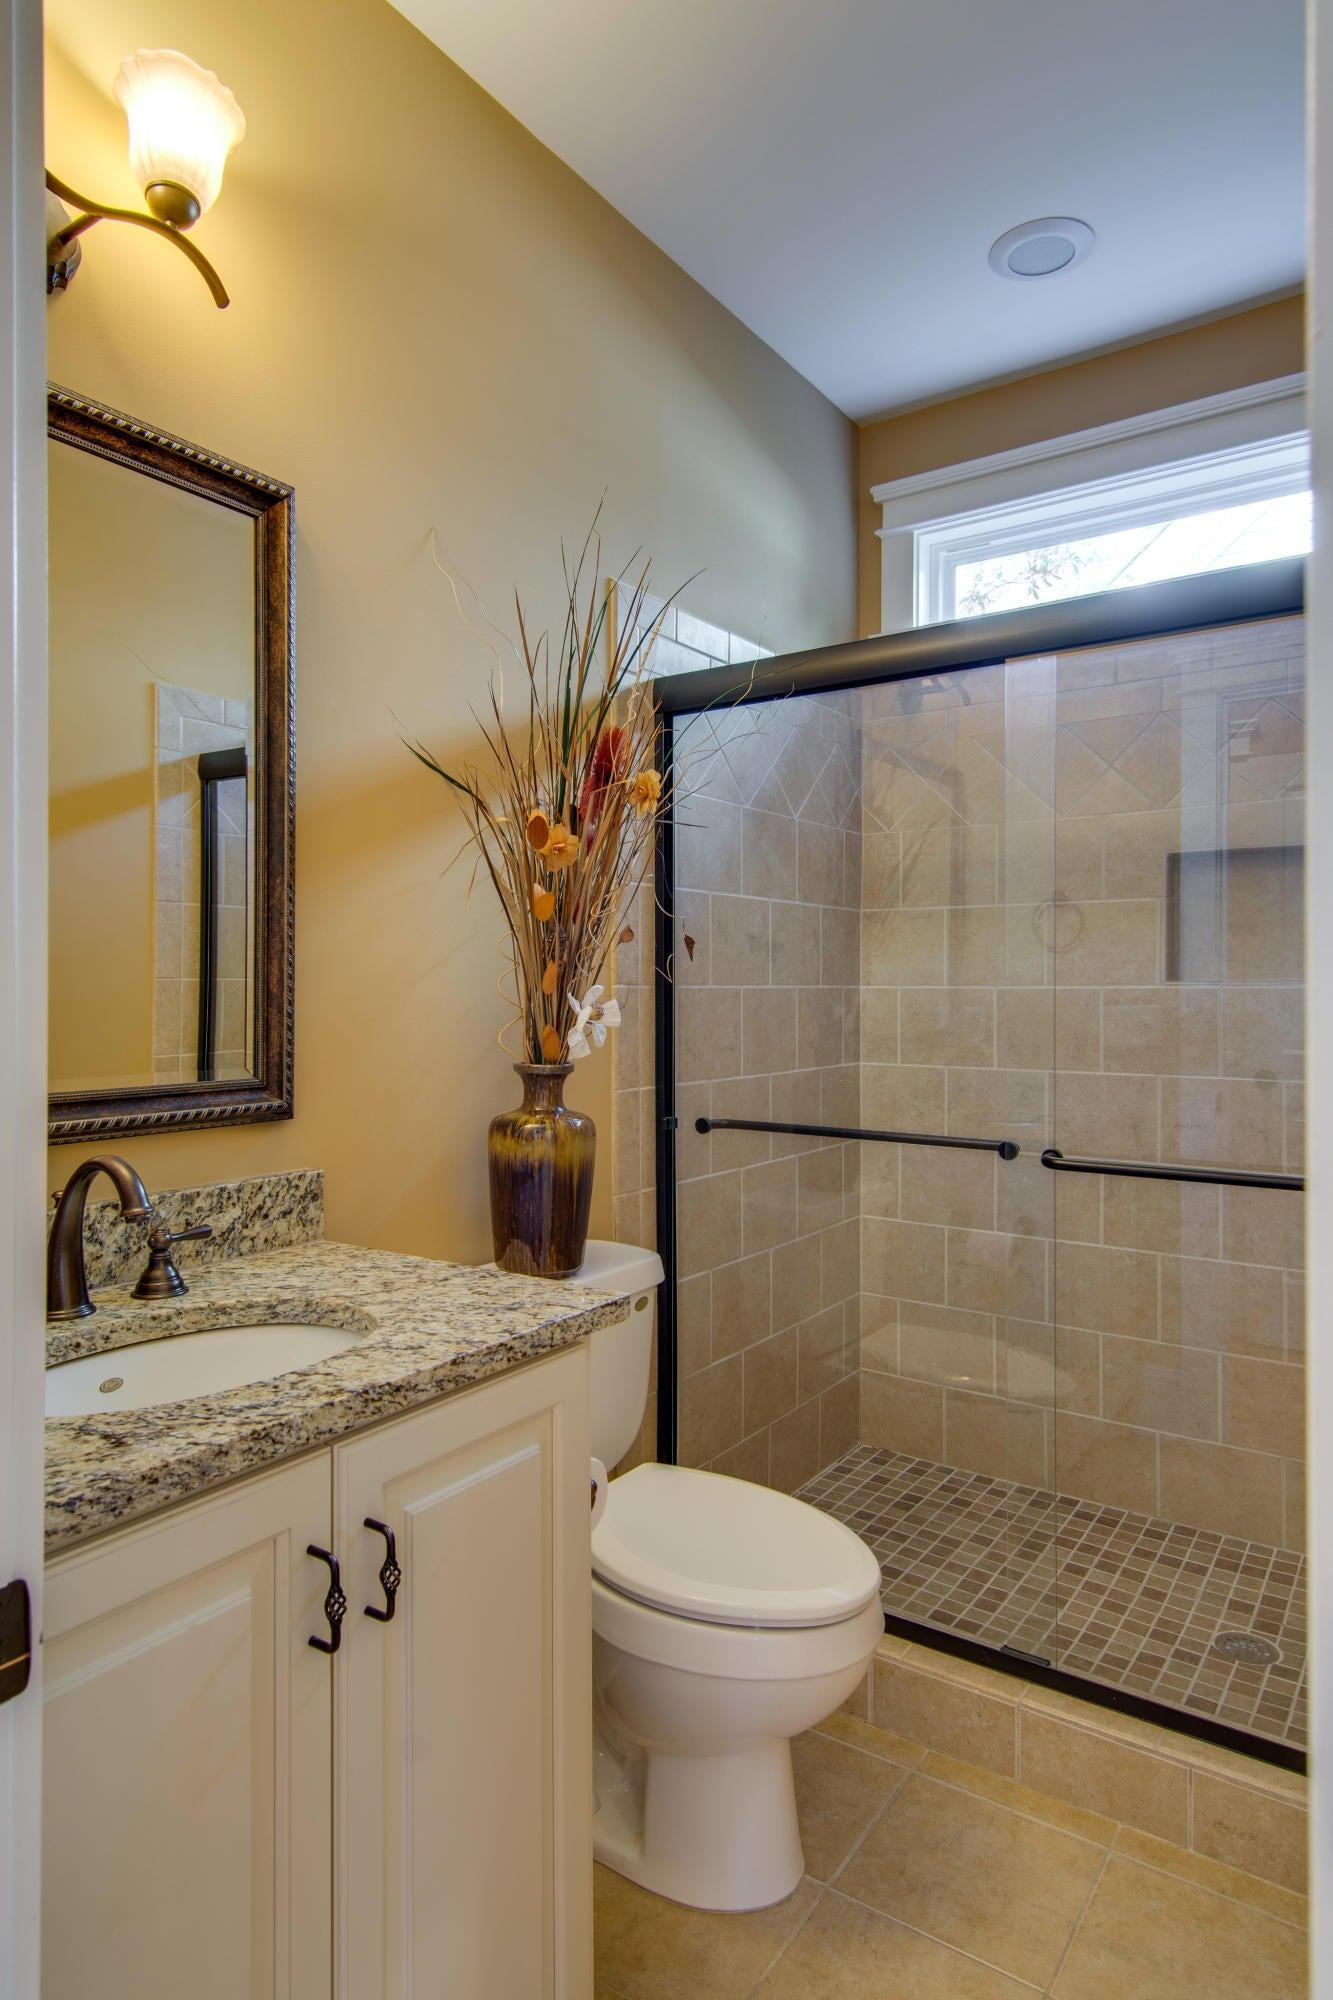 Bull Creek Peninsula Homes For Sale - 1635 Bull Creek, Charleston, SC - 25